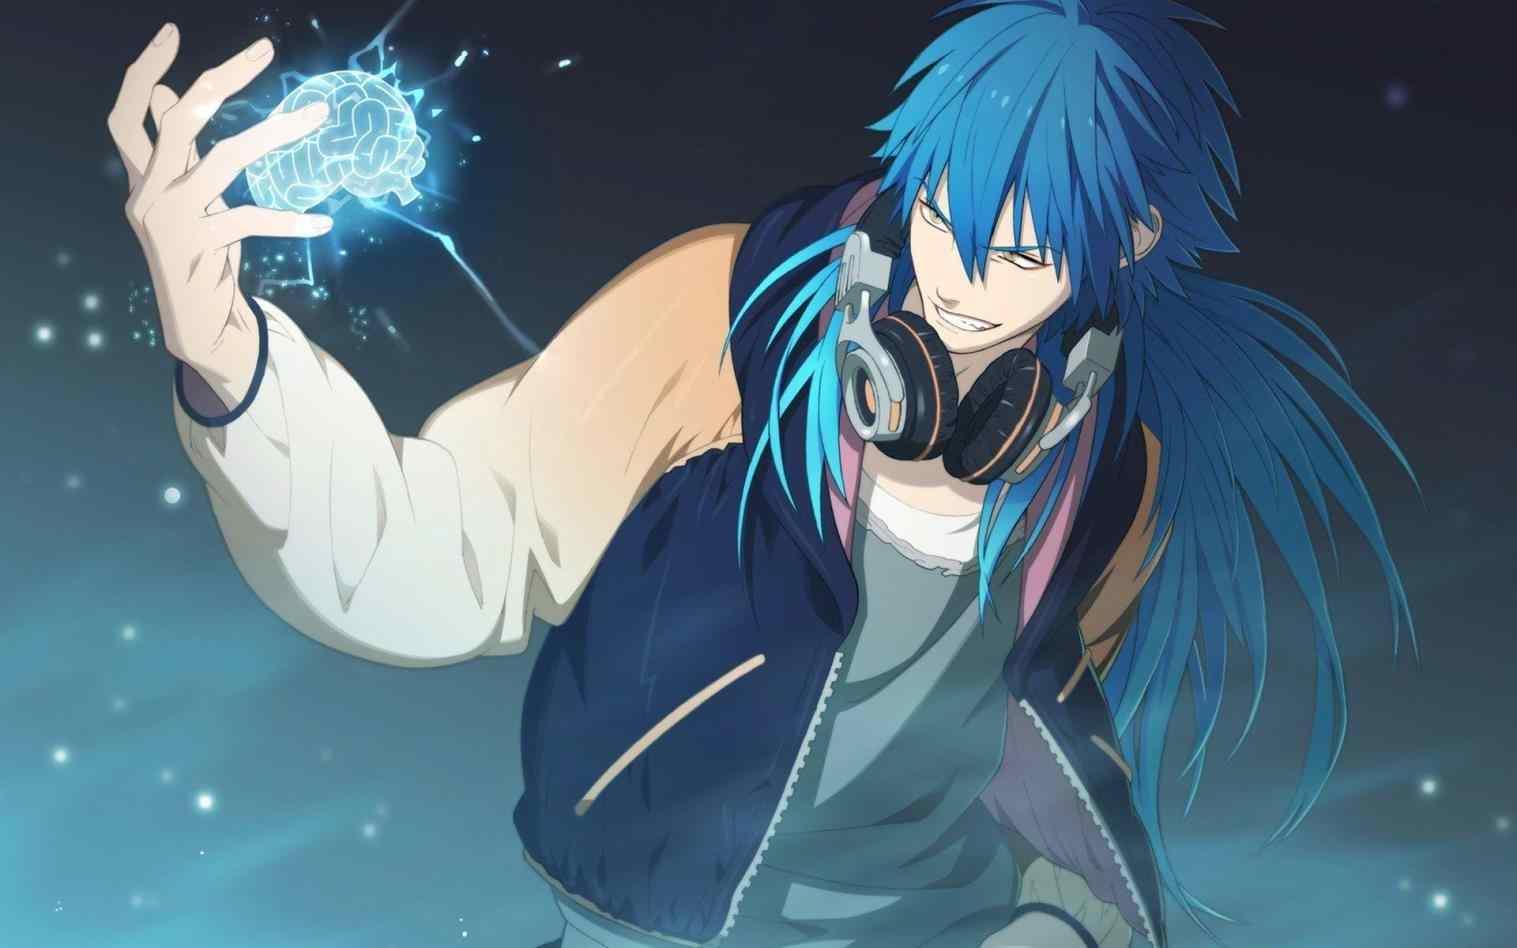 Anime Dj: Anime Headphones Wallpapers